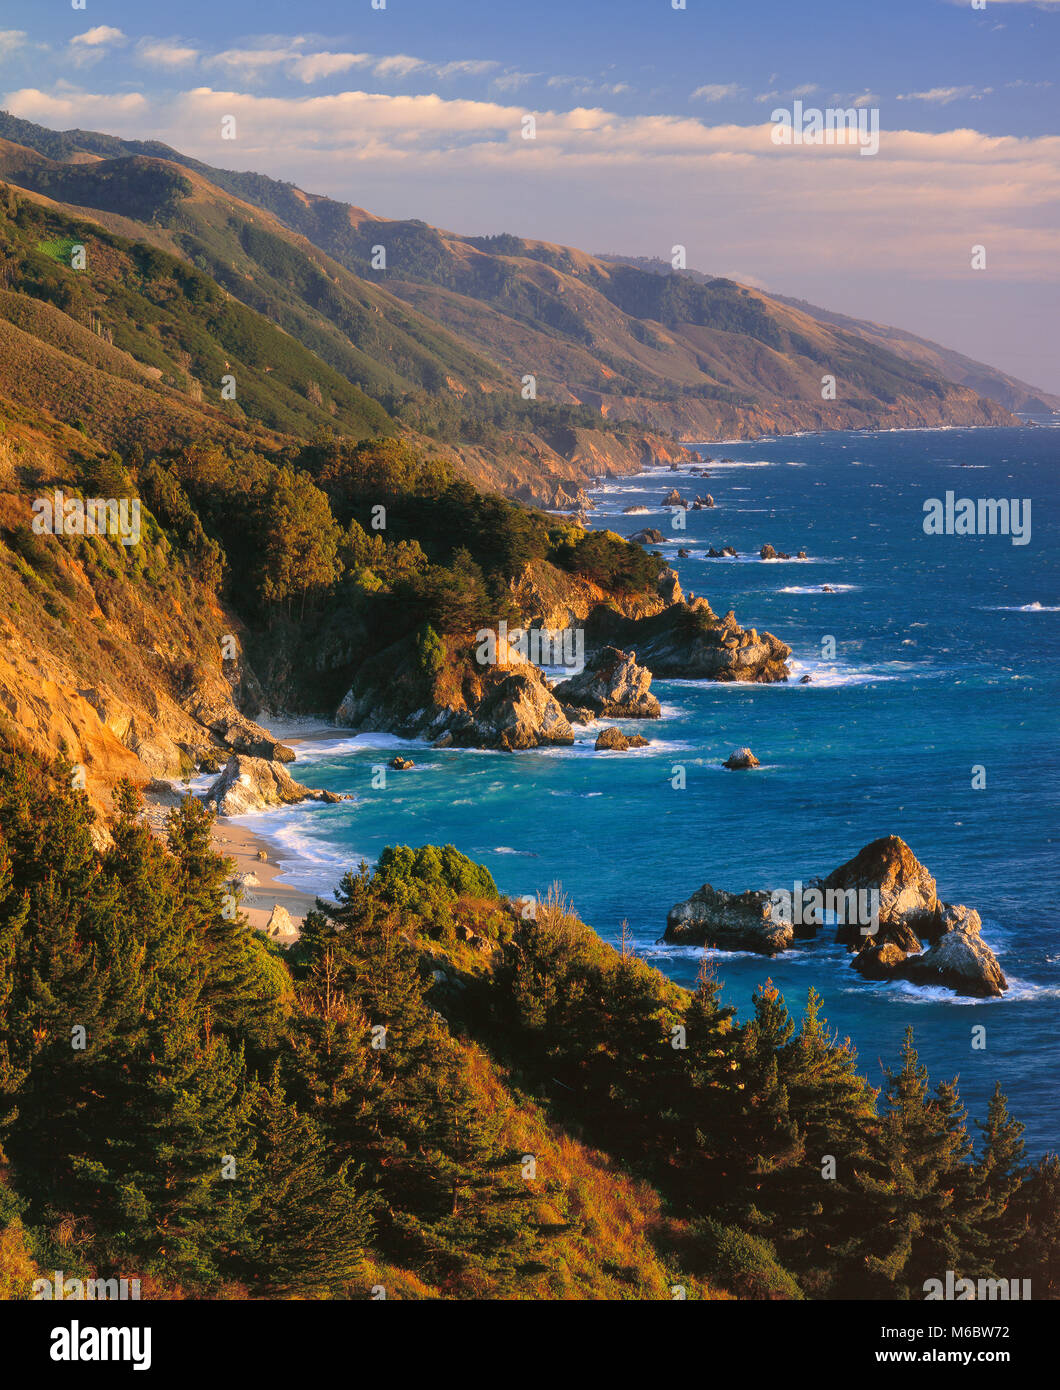 Costa, Pfeiffer-Burns State Park, Big Sur, el Condado de Monterey, California Imagen De Stock